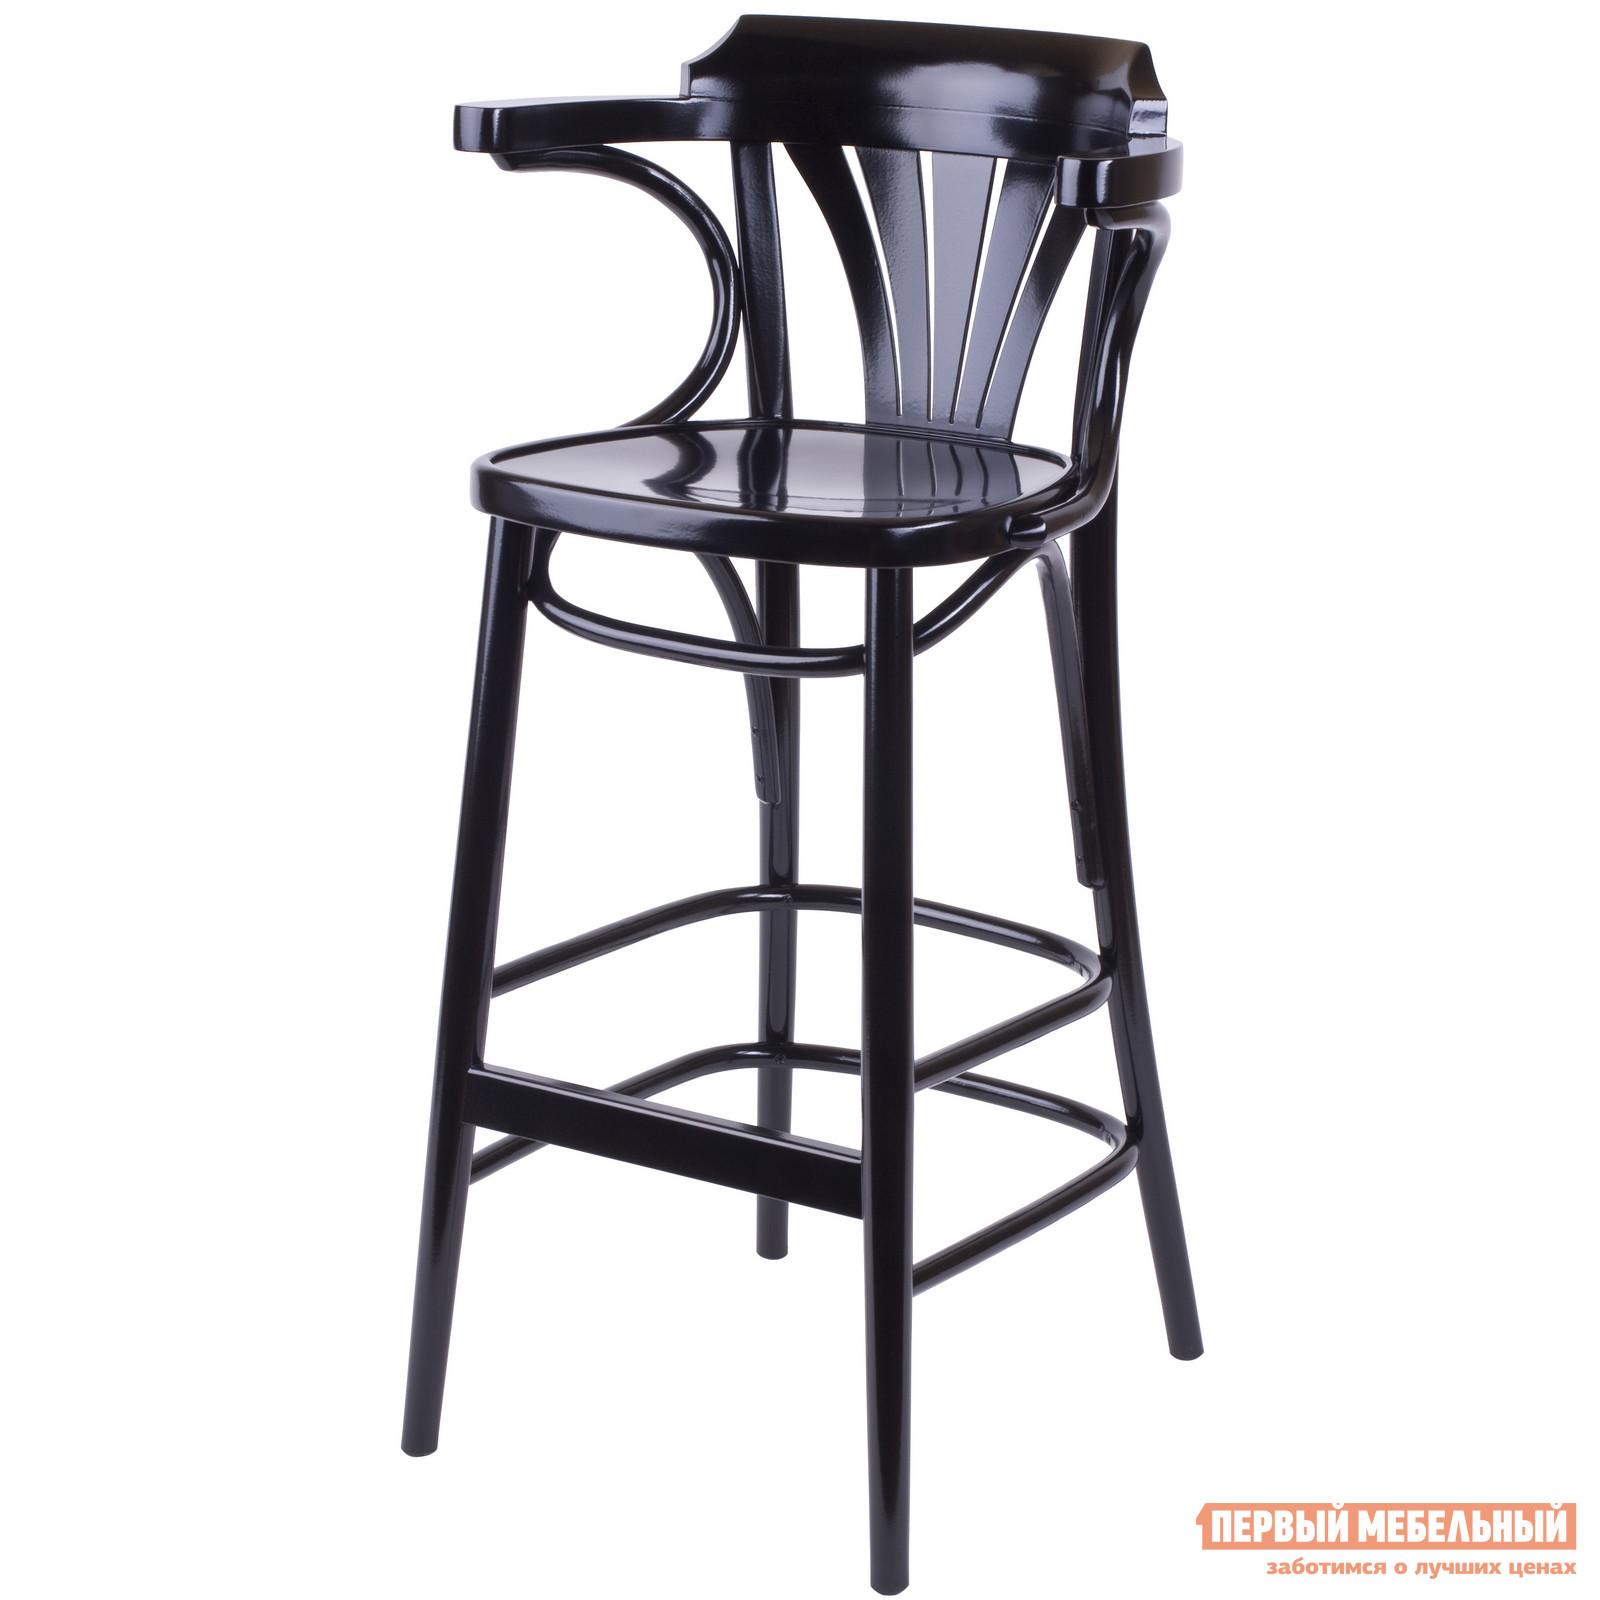 Барный стул LeoMarin Bst-6023